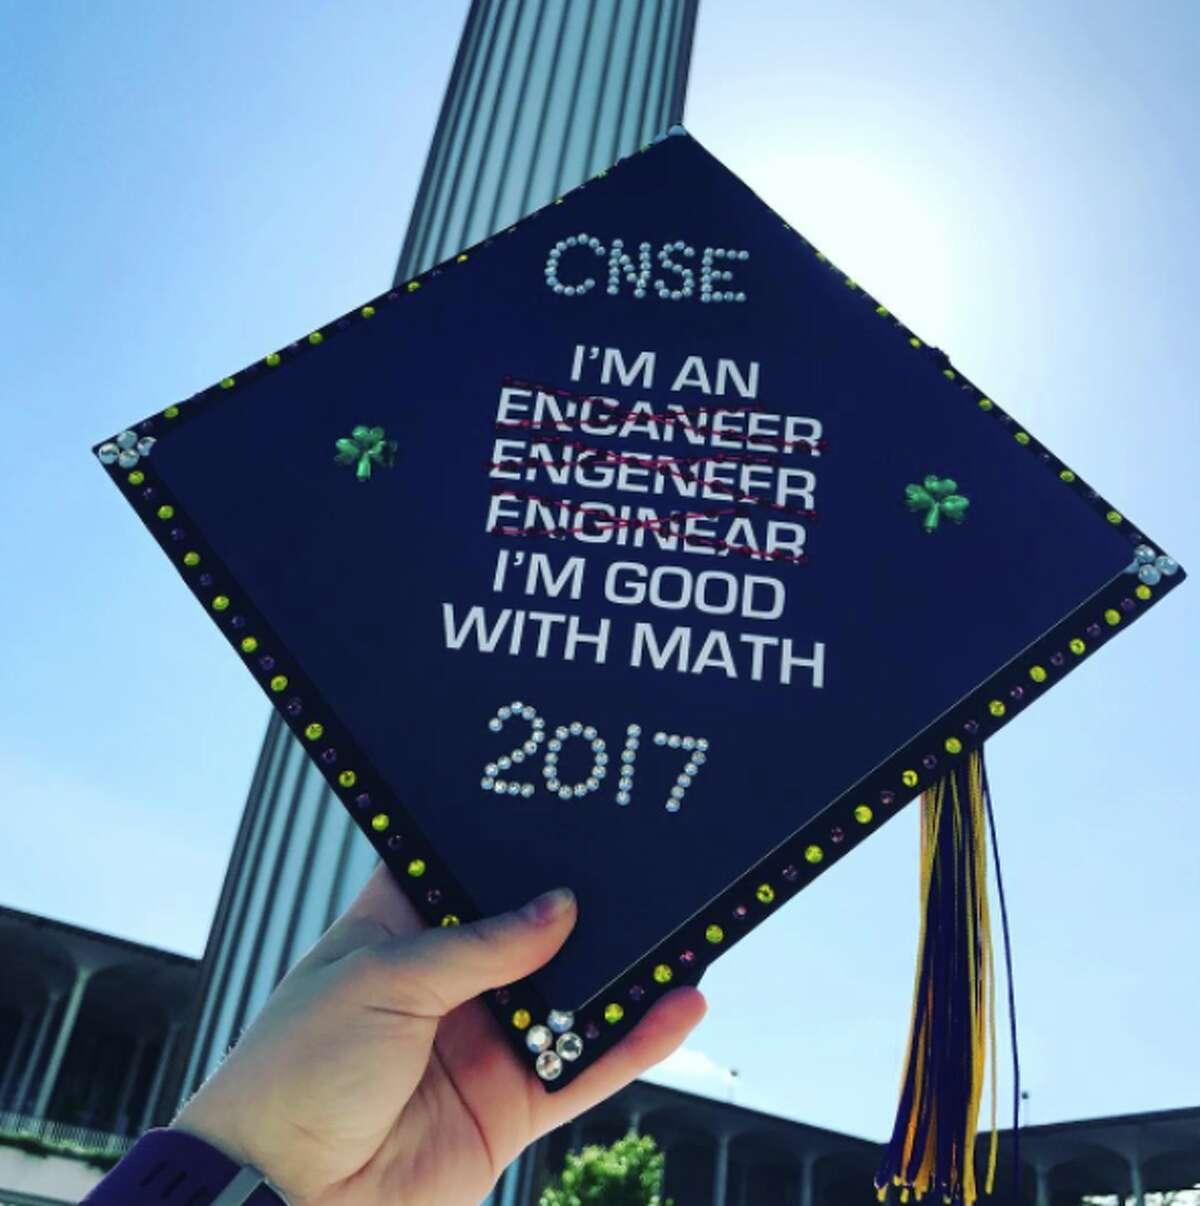 Photo credit: Casey Biederman, 2017 University at Albany graduate